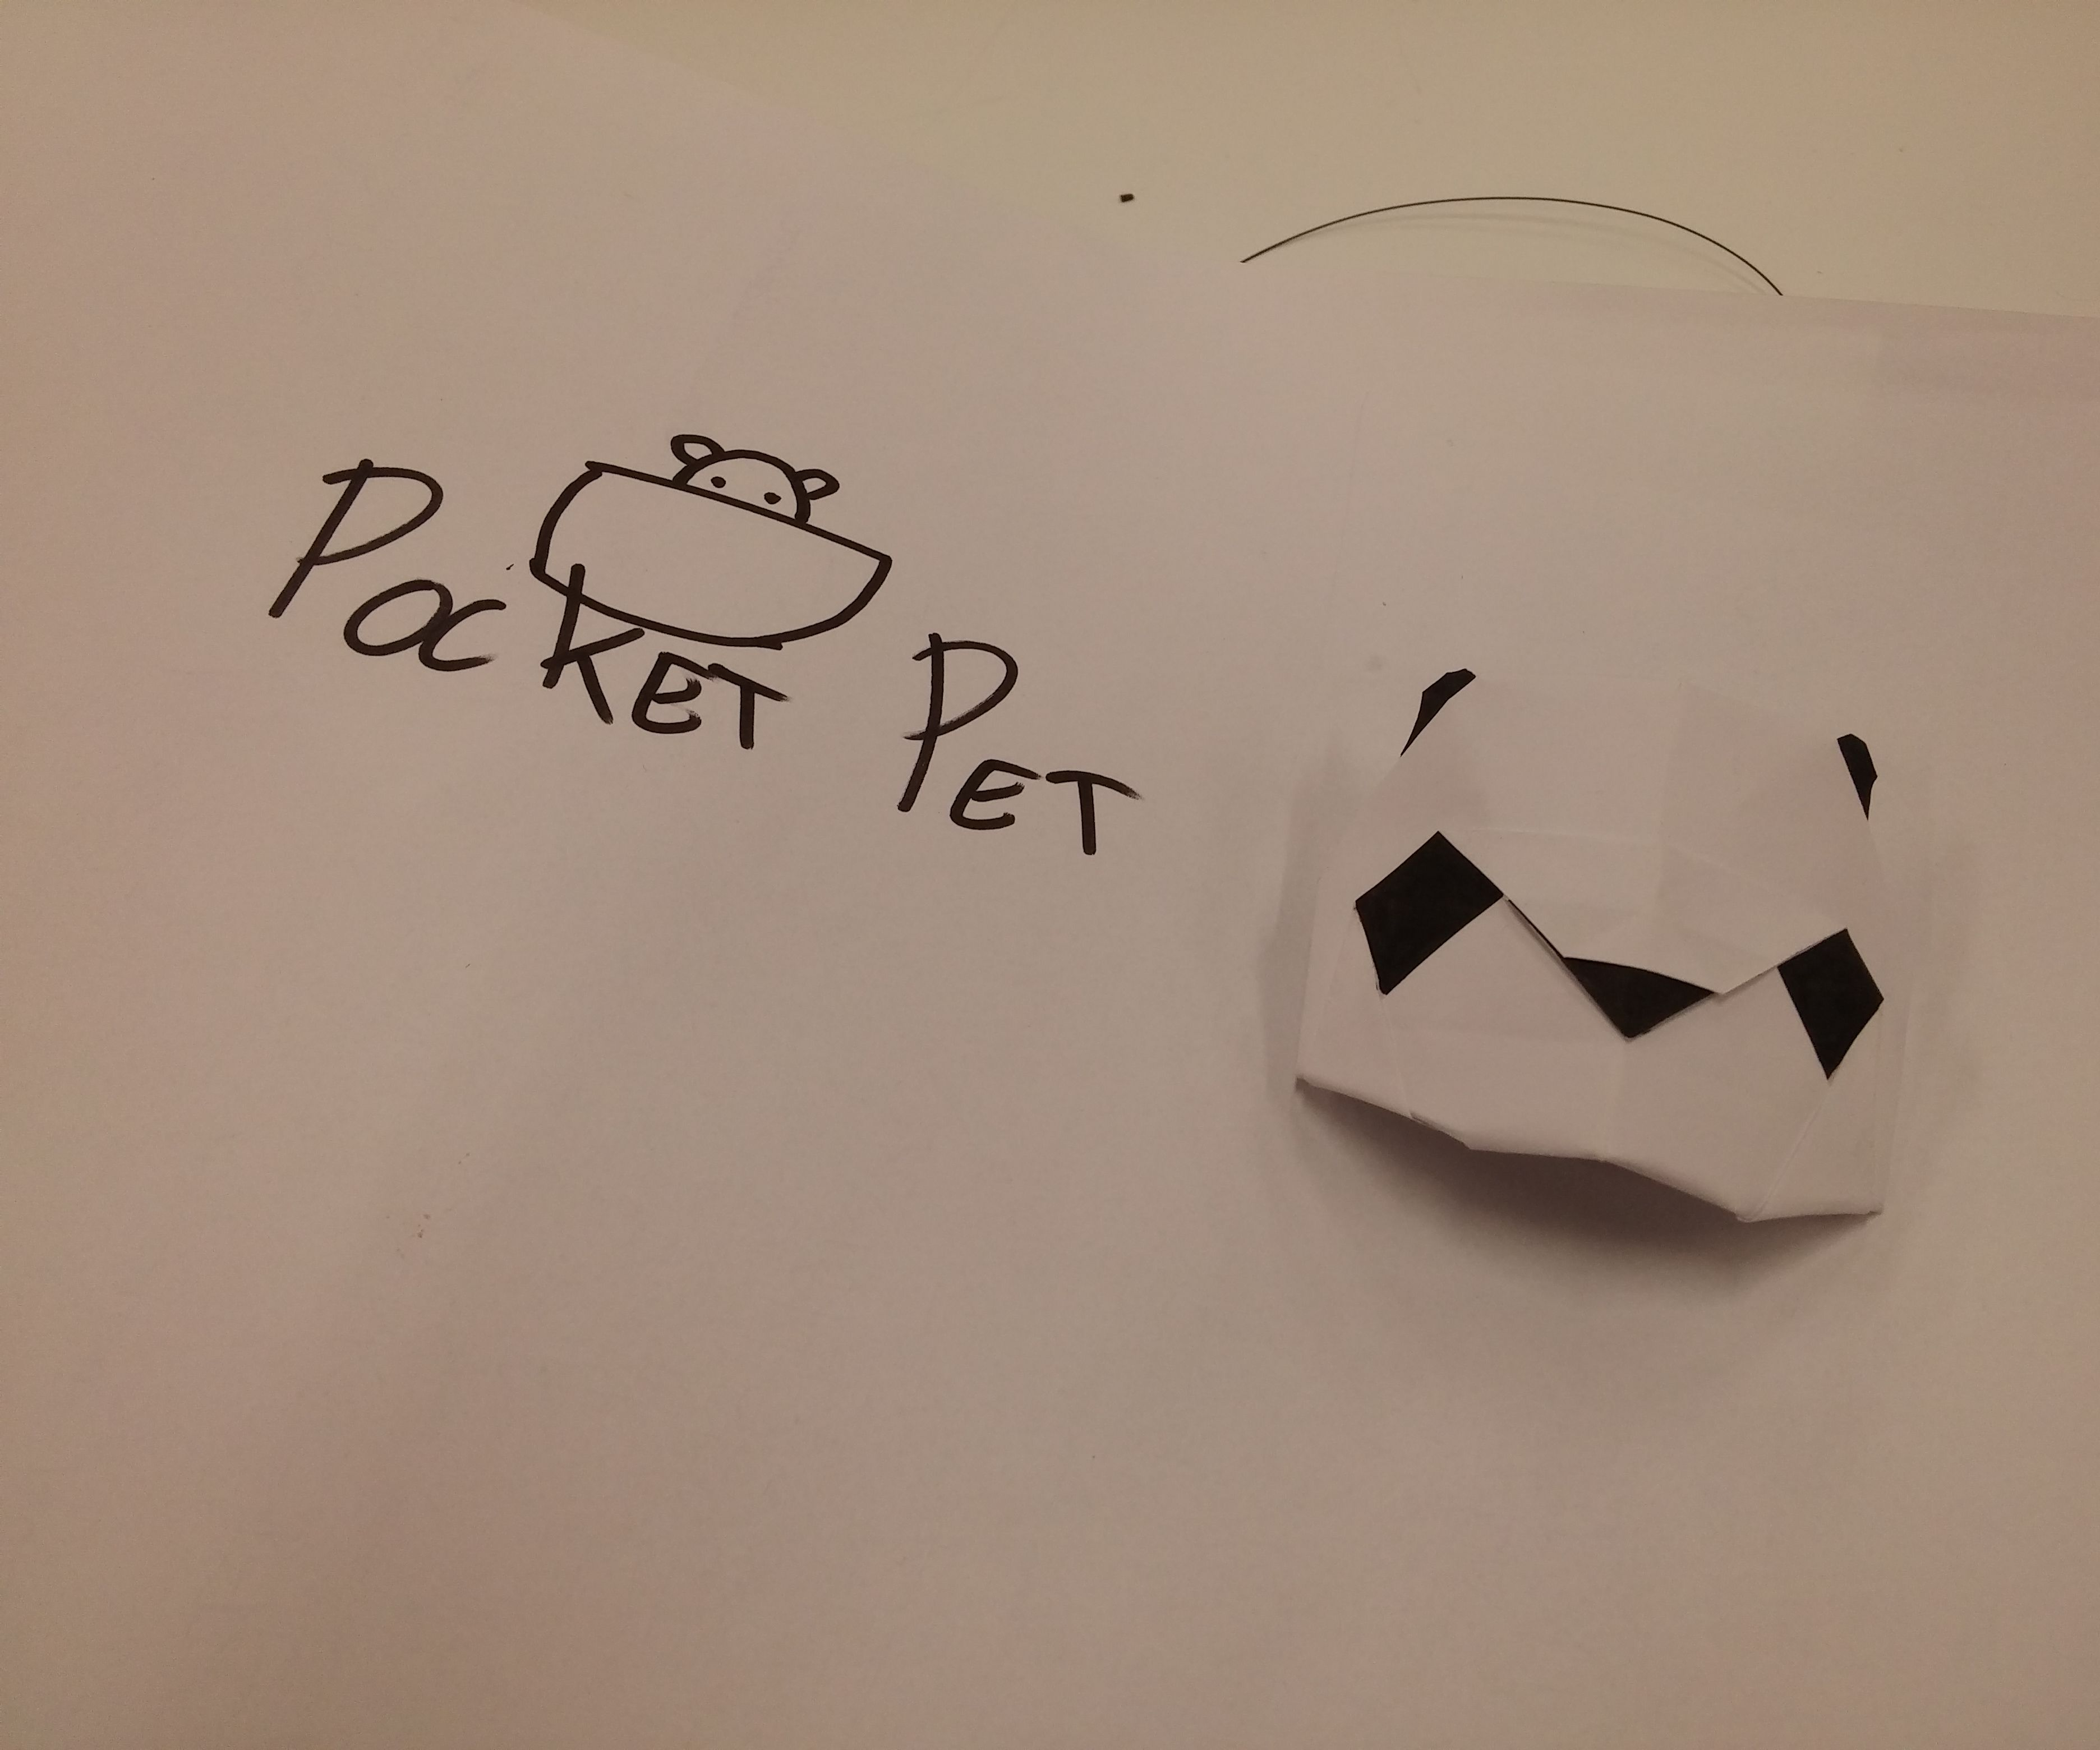 Paper Pocket Pets